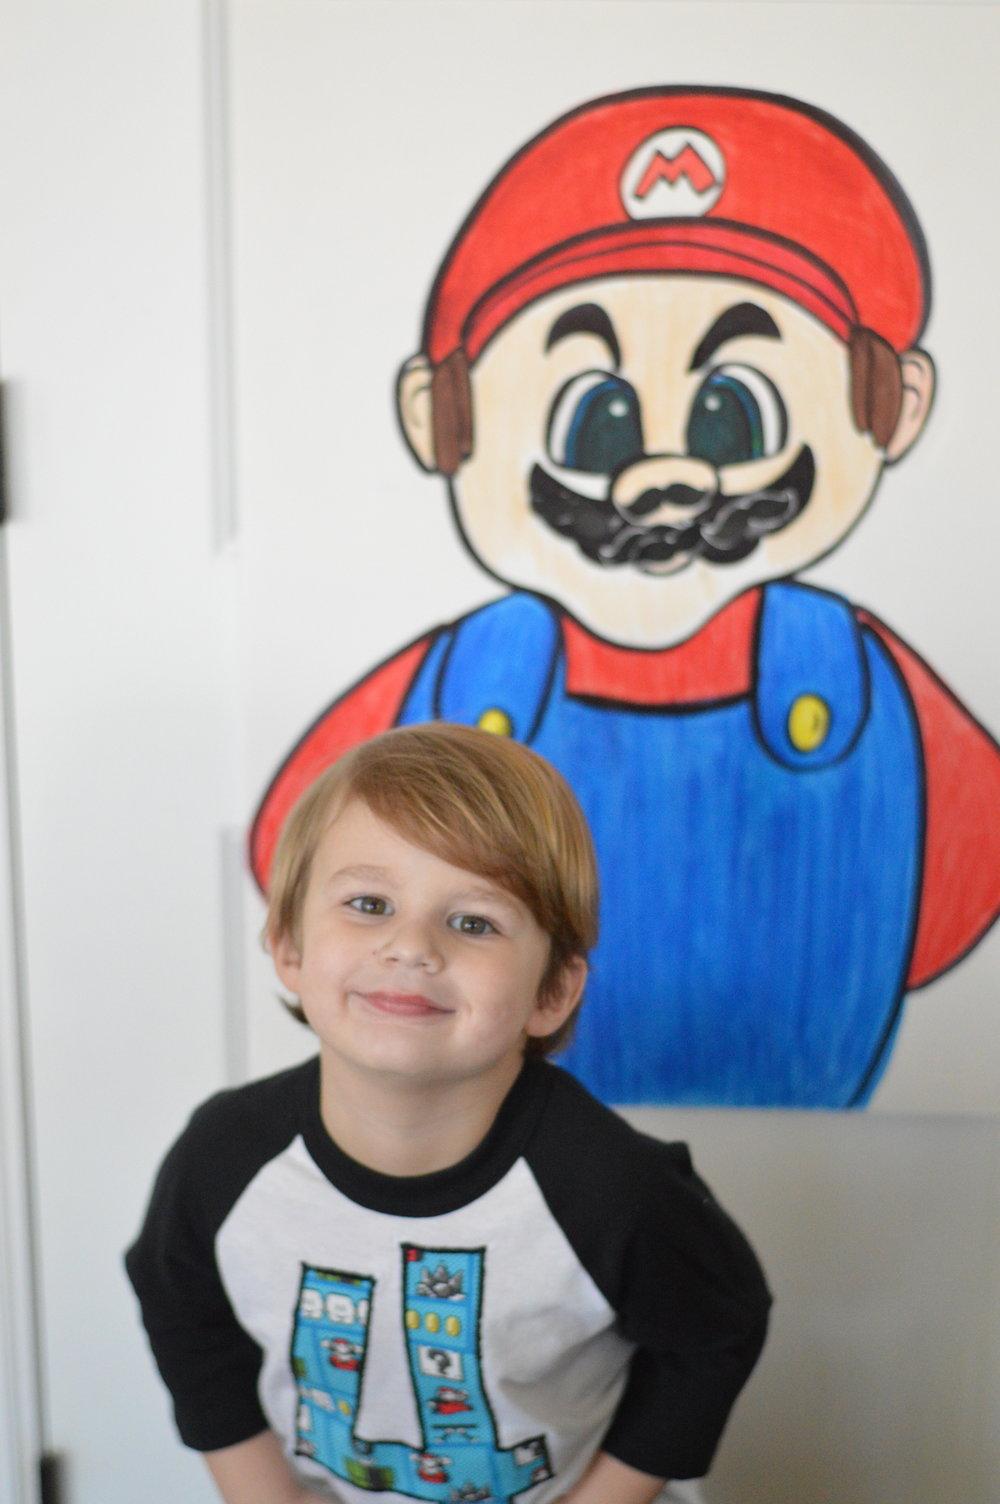 Mario birthday games